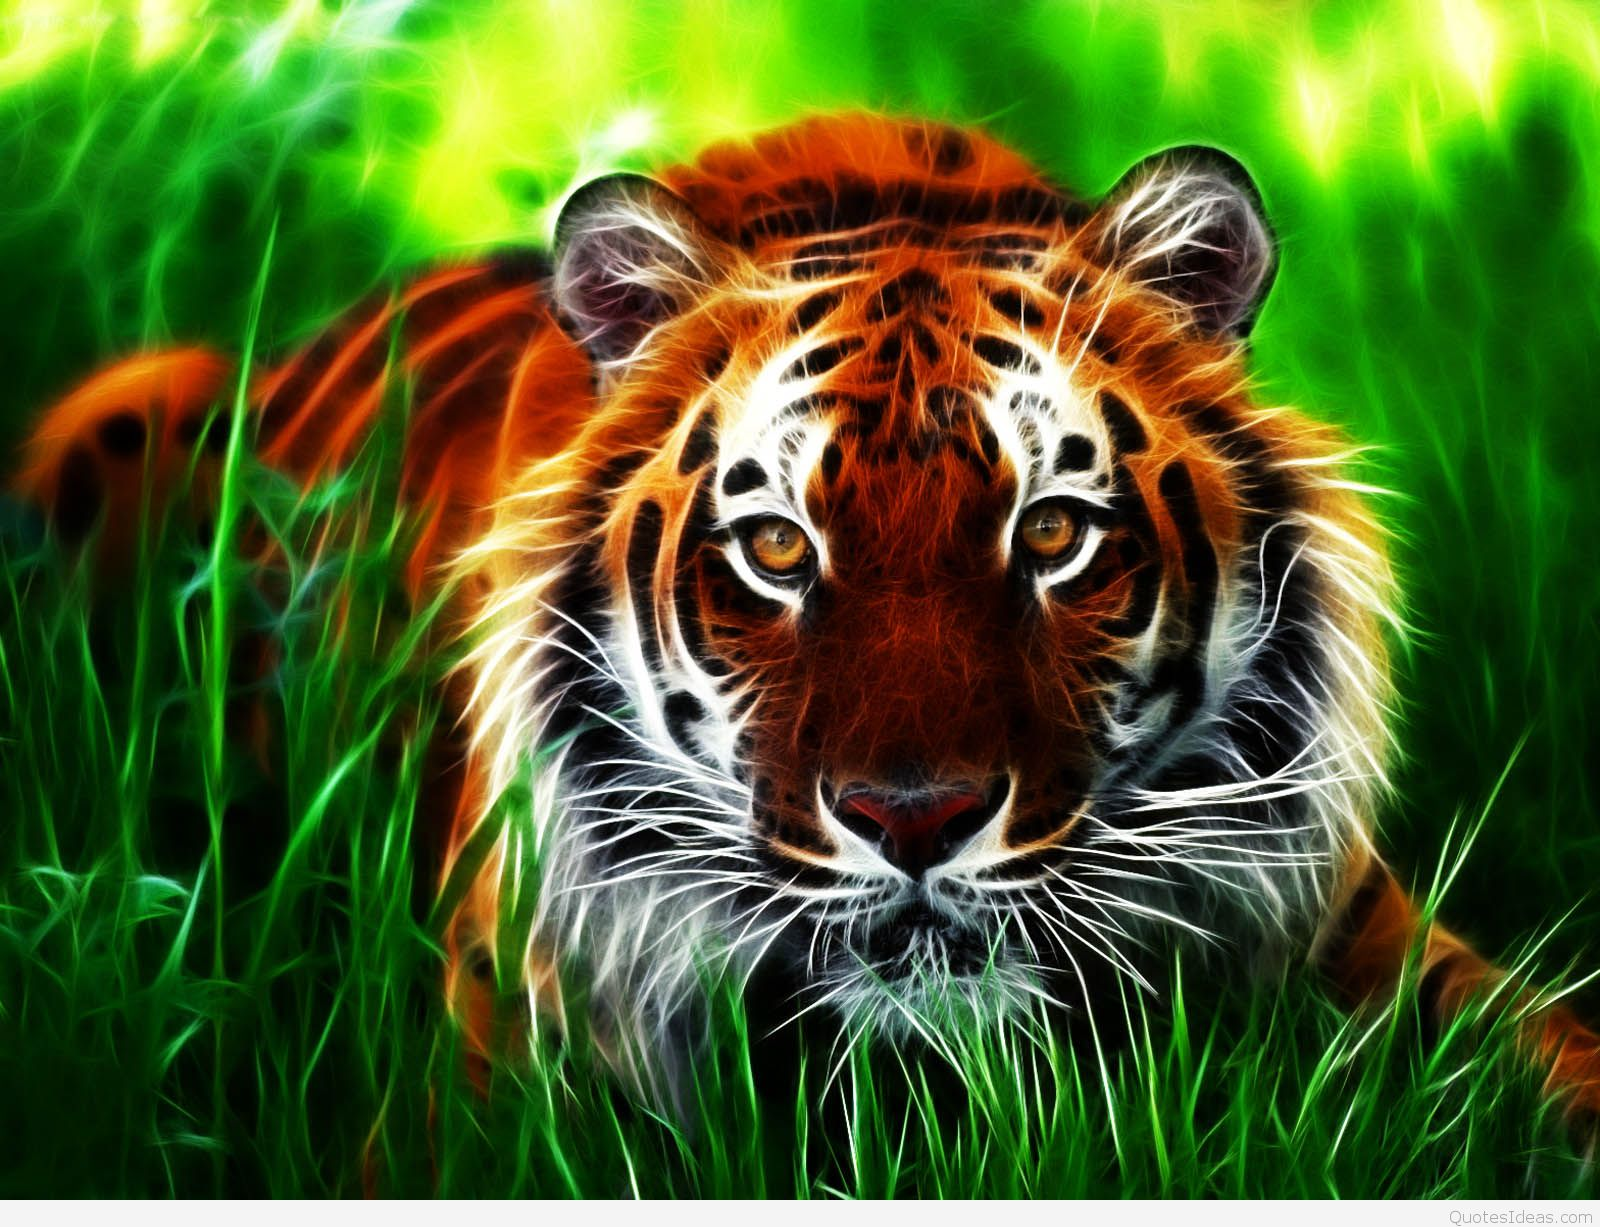 3d Animated Wallpaper For Mobile Hd Tiger 1600x1227 Wallpaper Teahub Io